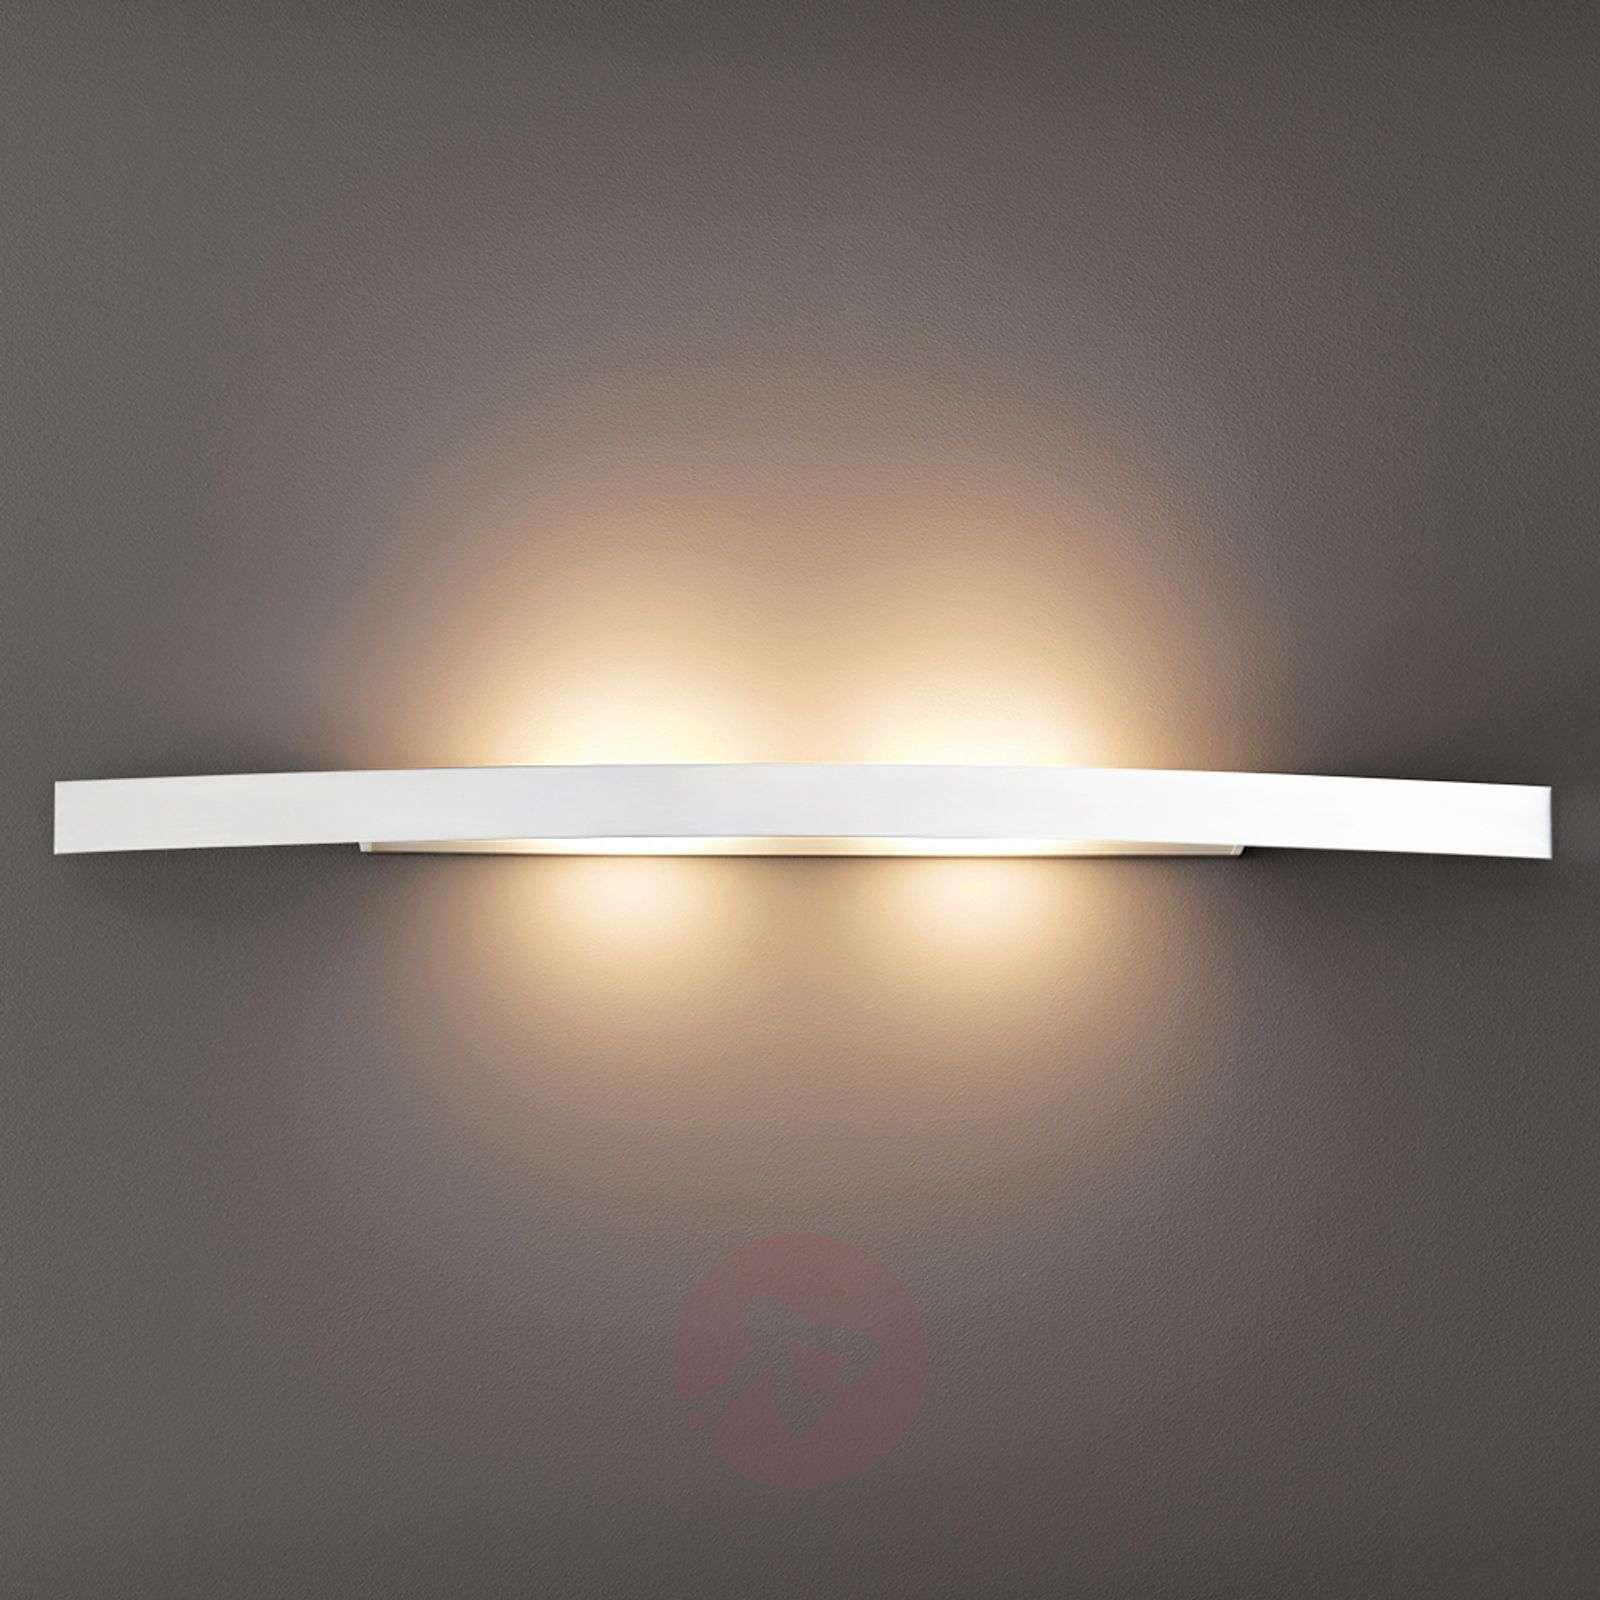 High-quality LED wall light Riga-3520385-01